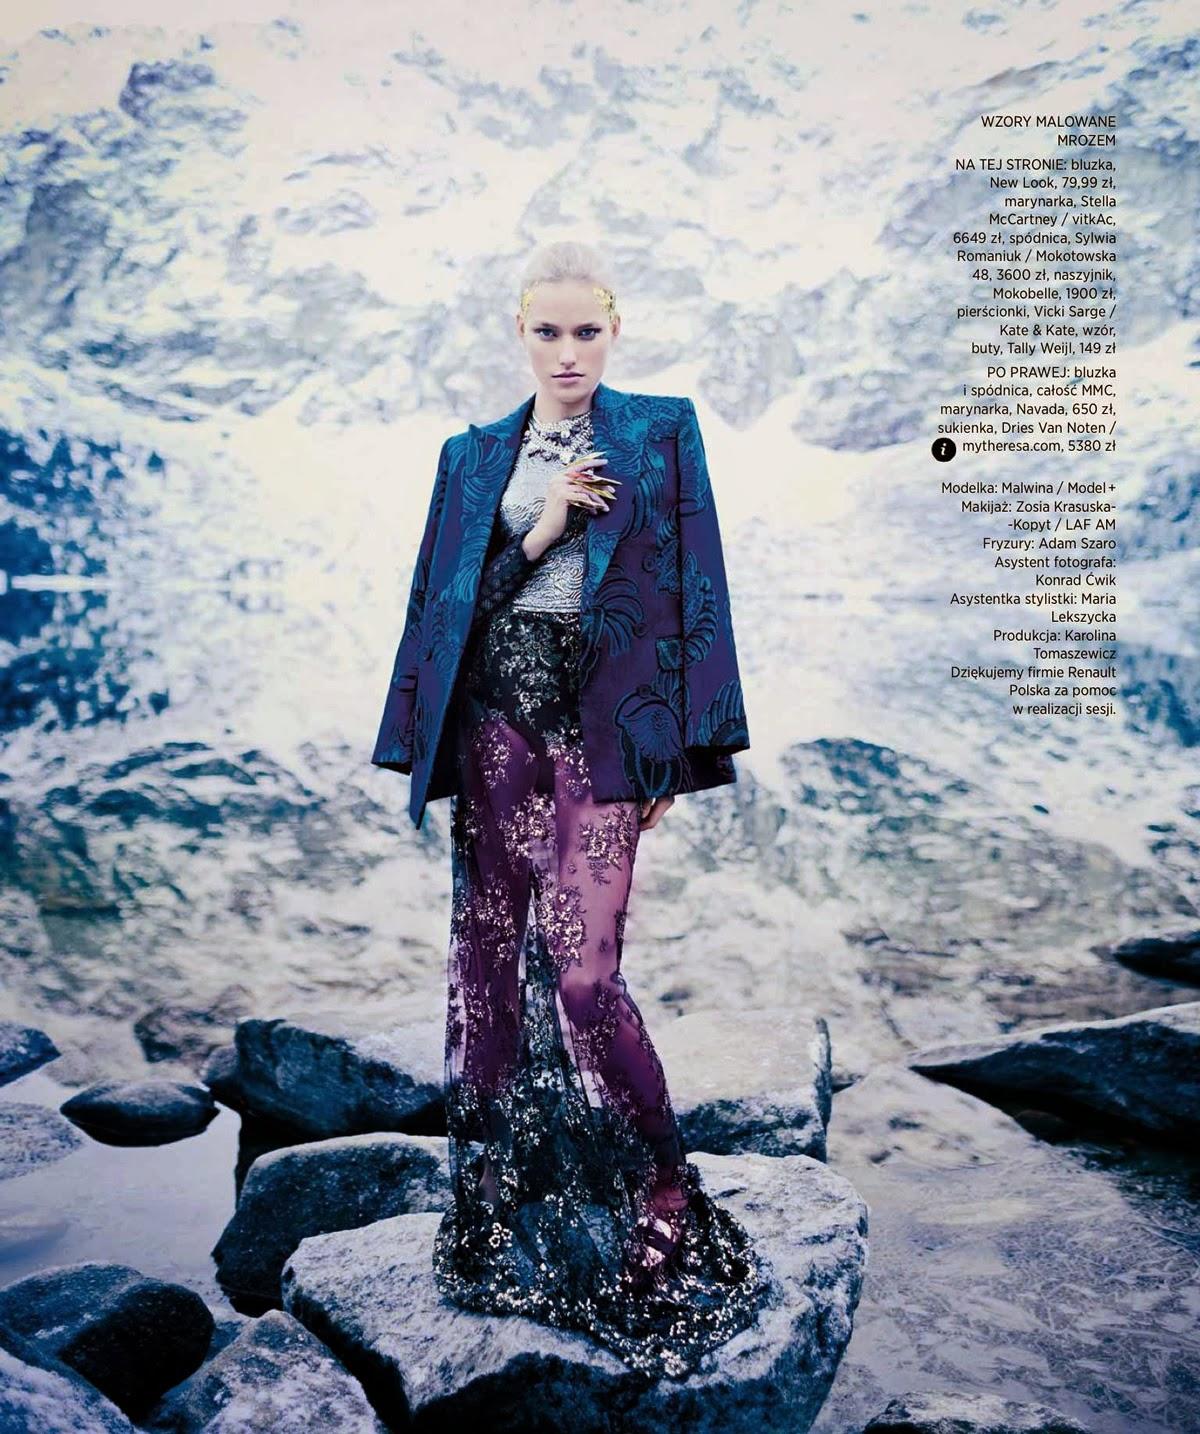 Magazine Photoshoot : Malwina Garstka Photoshot by Artur Wesolowski for Harper's Bazaar Magazine Poland 2014